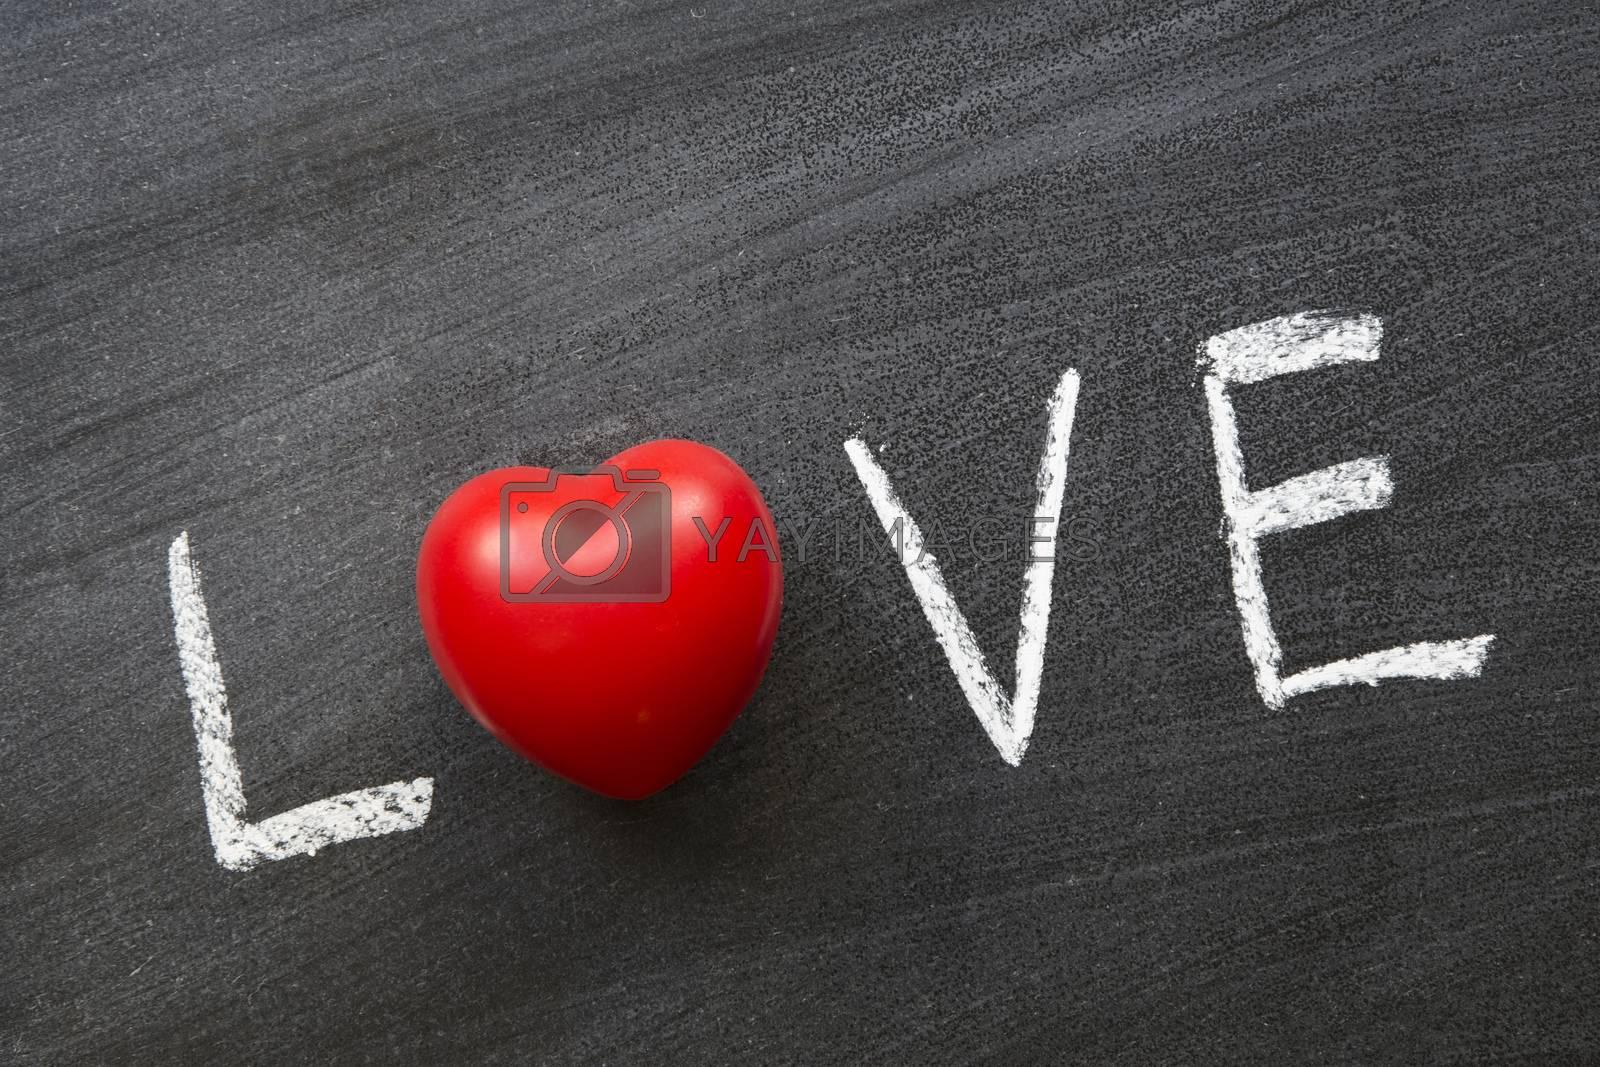 love word handwritten on blackboard with red heart instead of o